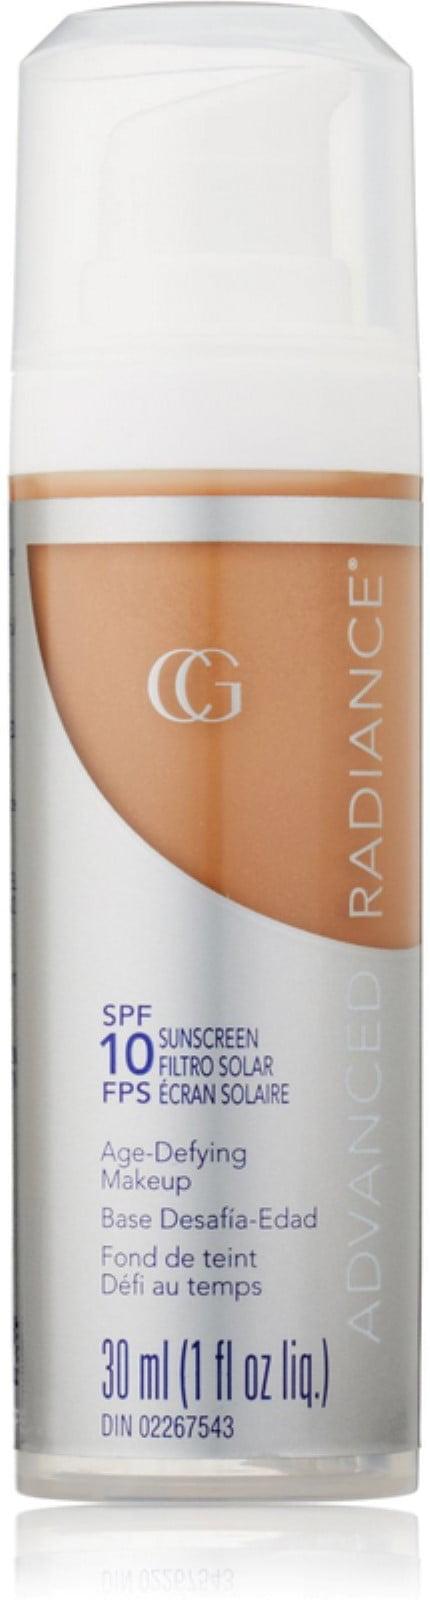 4 Pack - CoverGirl Advanced Radiance Age-Defying Makeup, Soft Honey [155], 1 oz Homeuse Skincare System Multitasking MTS